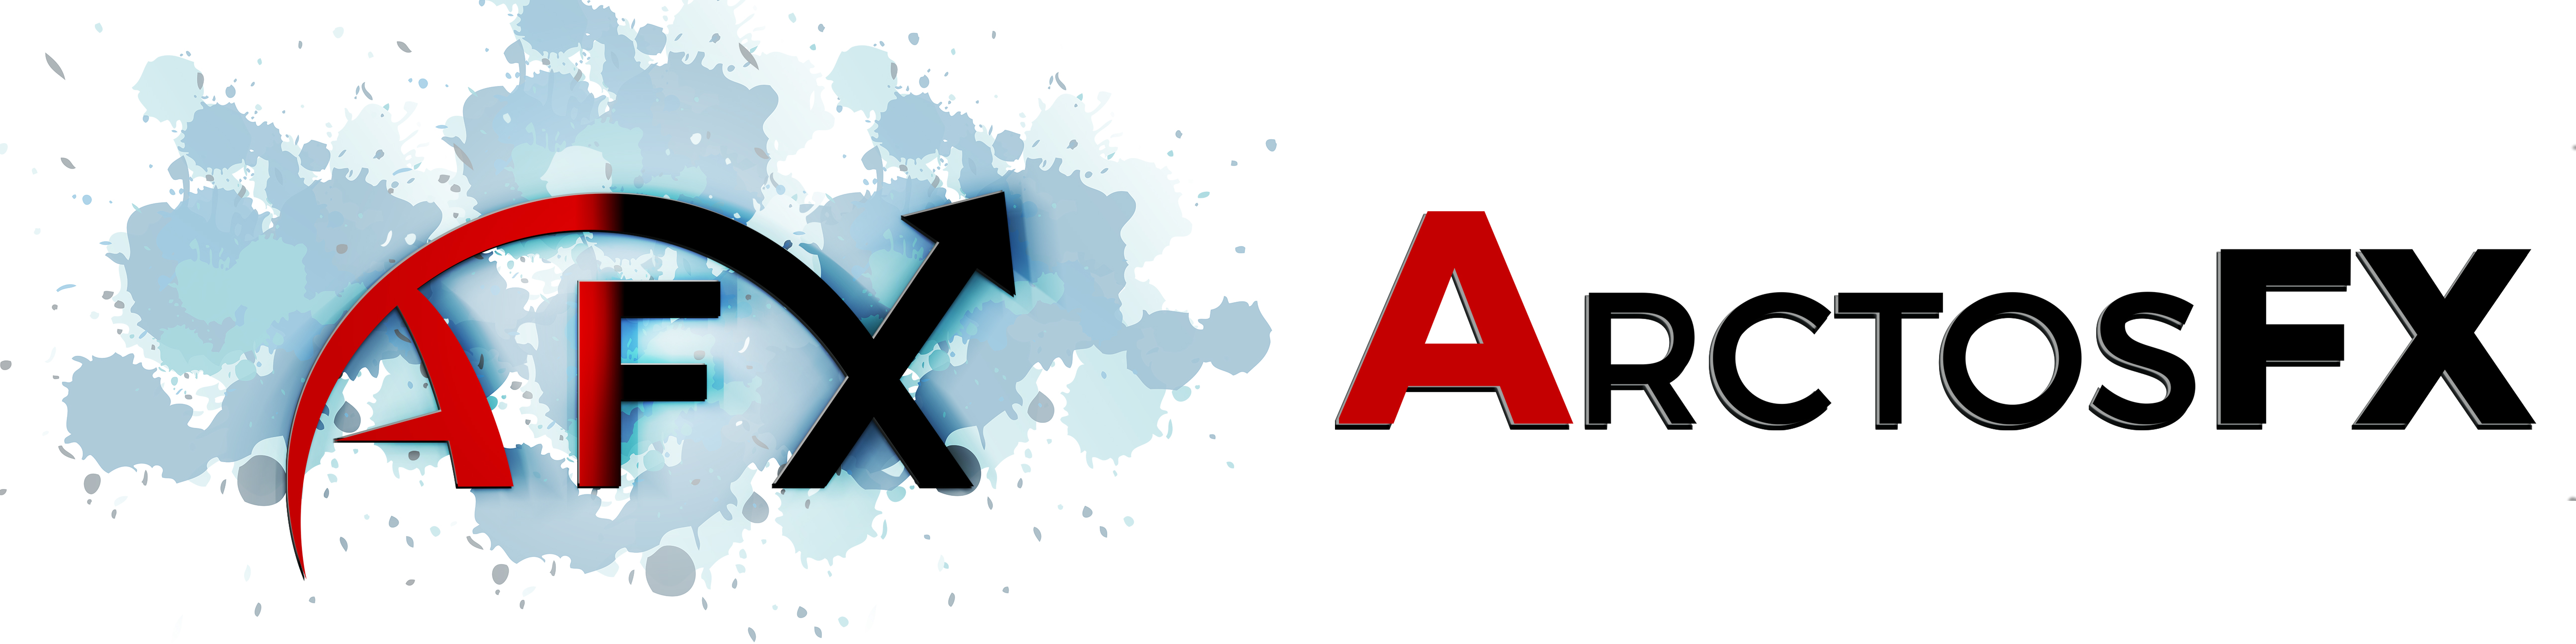 ArctosFX LLC